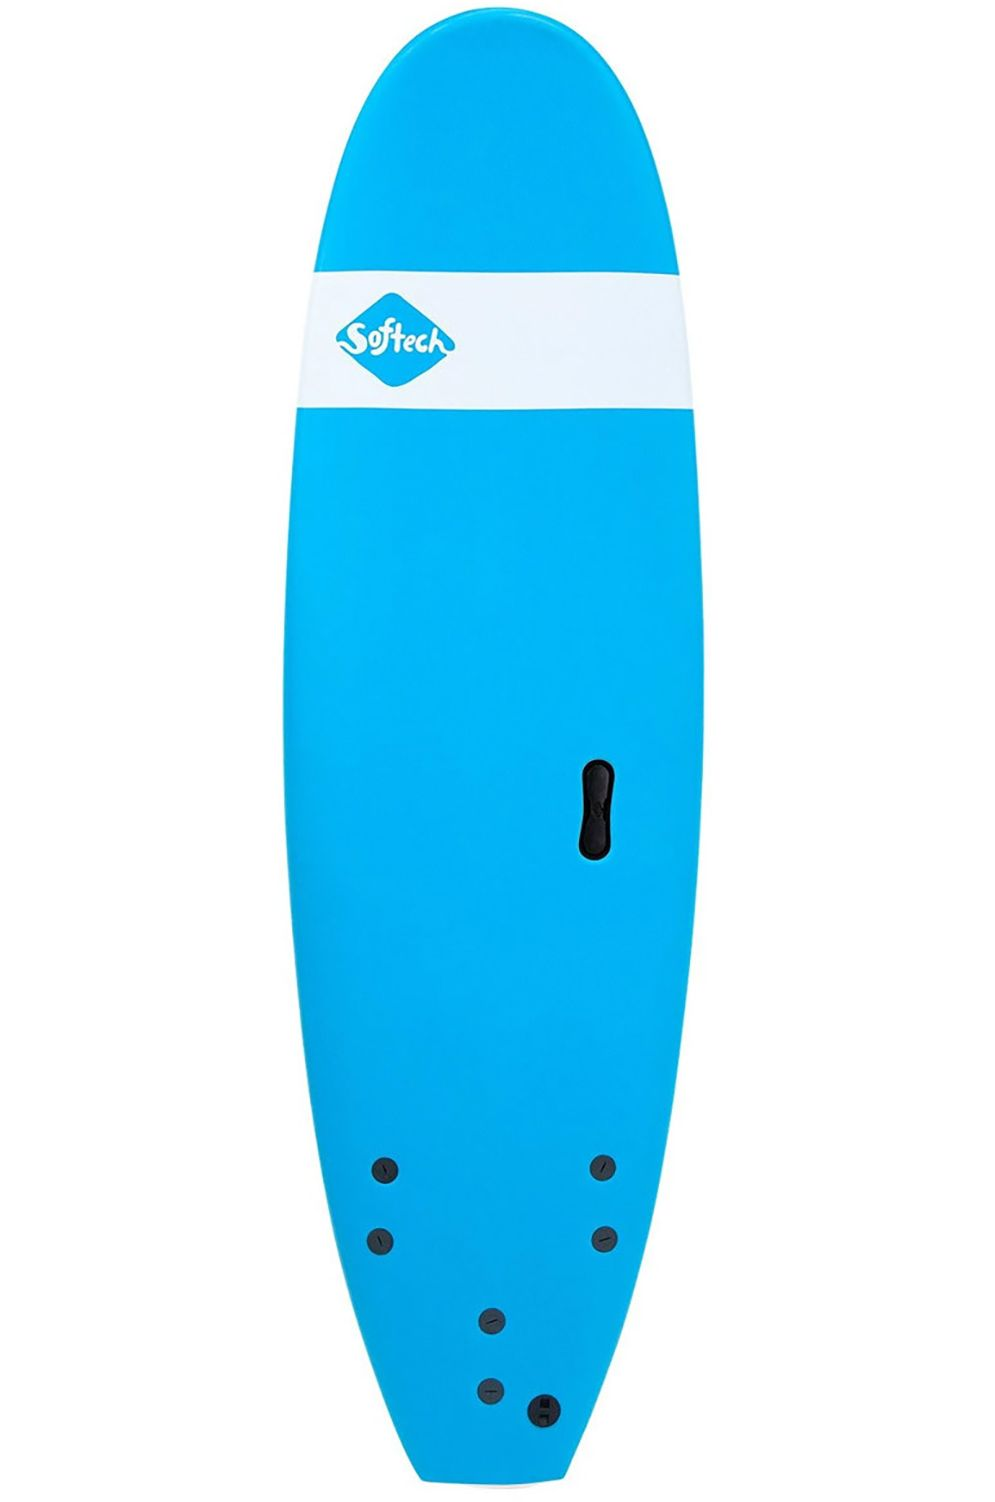 Prancha Surf Softech 9'0 ROLLER BLUE Square Tail - Color FCS 9ft0